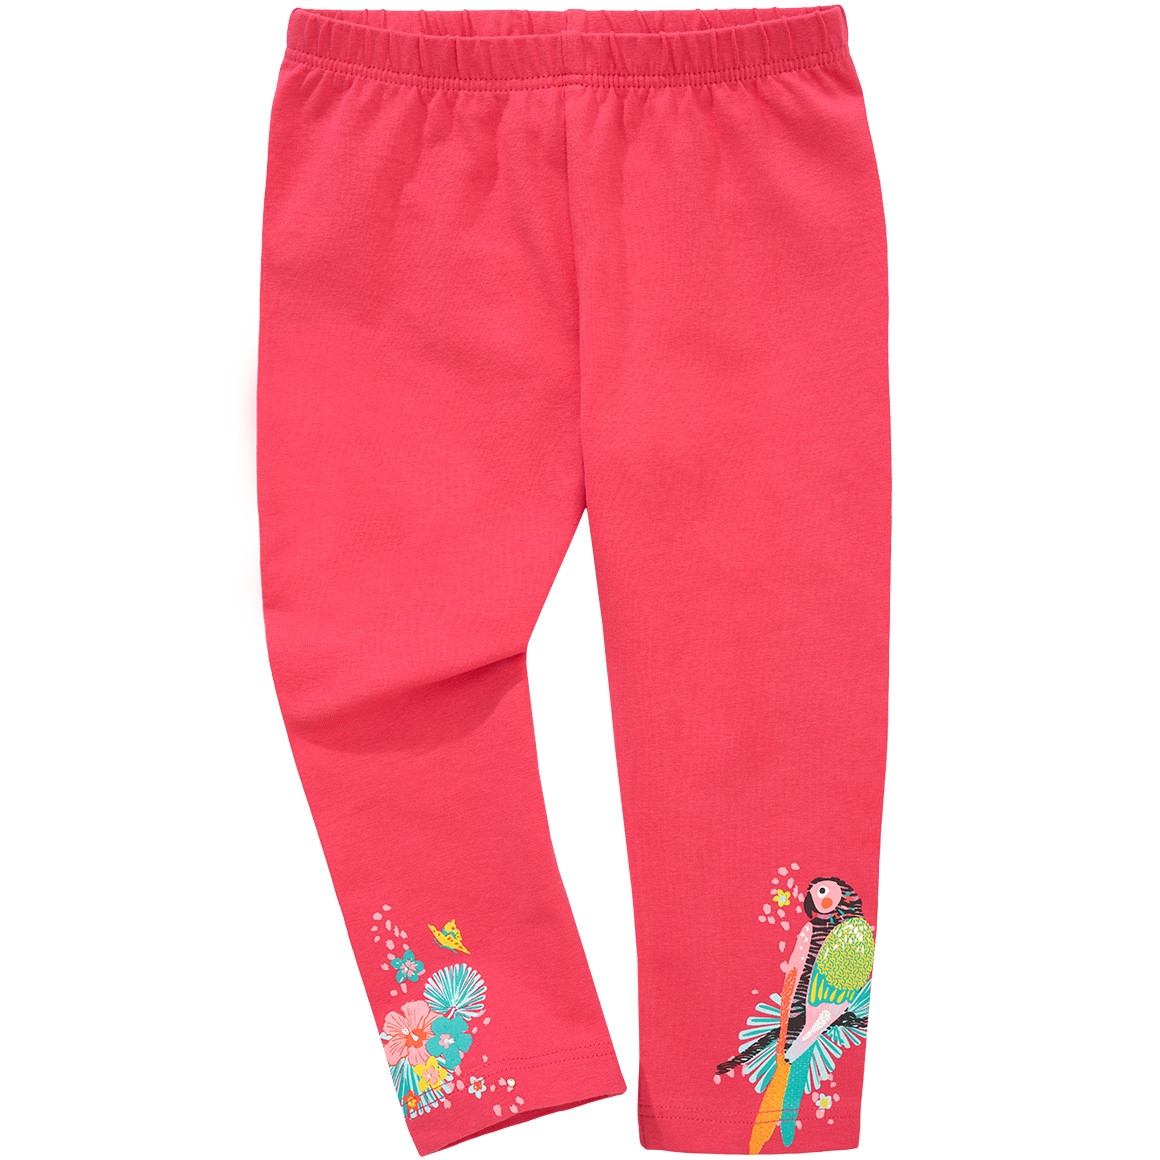 Mädchen Capri Leggings mit Print